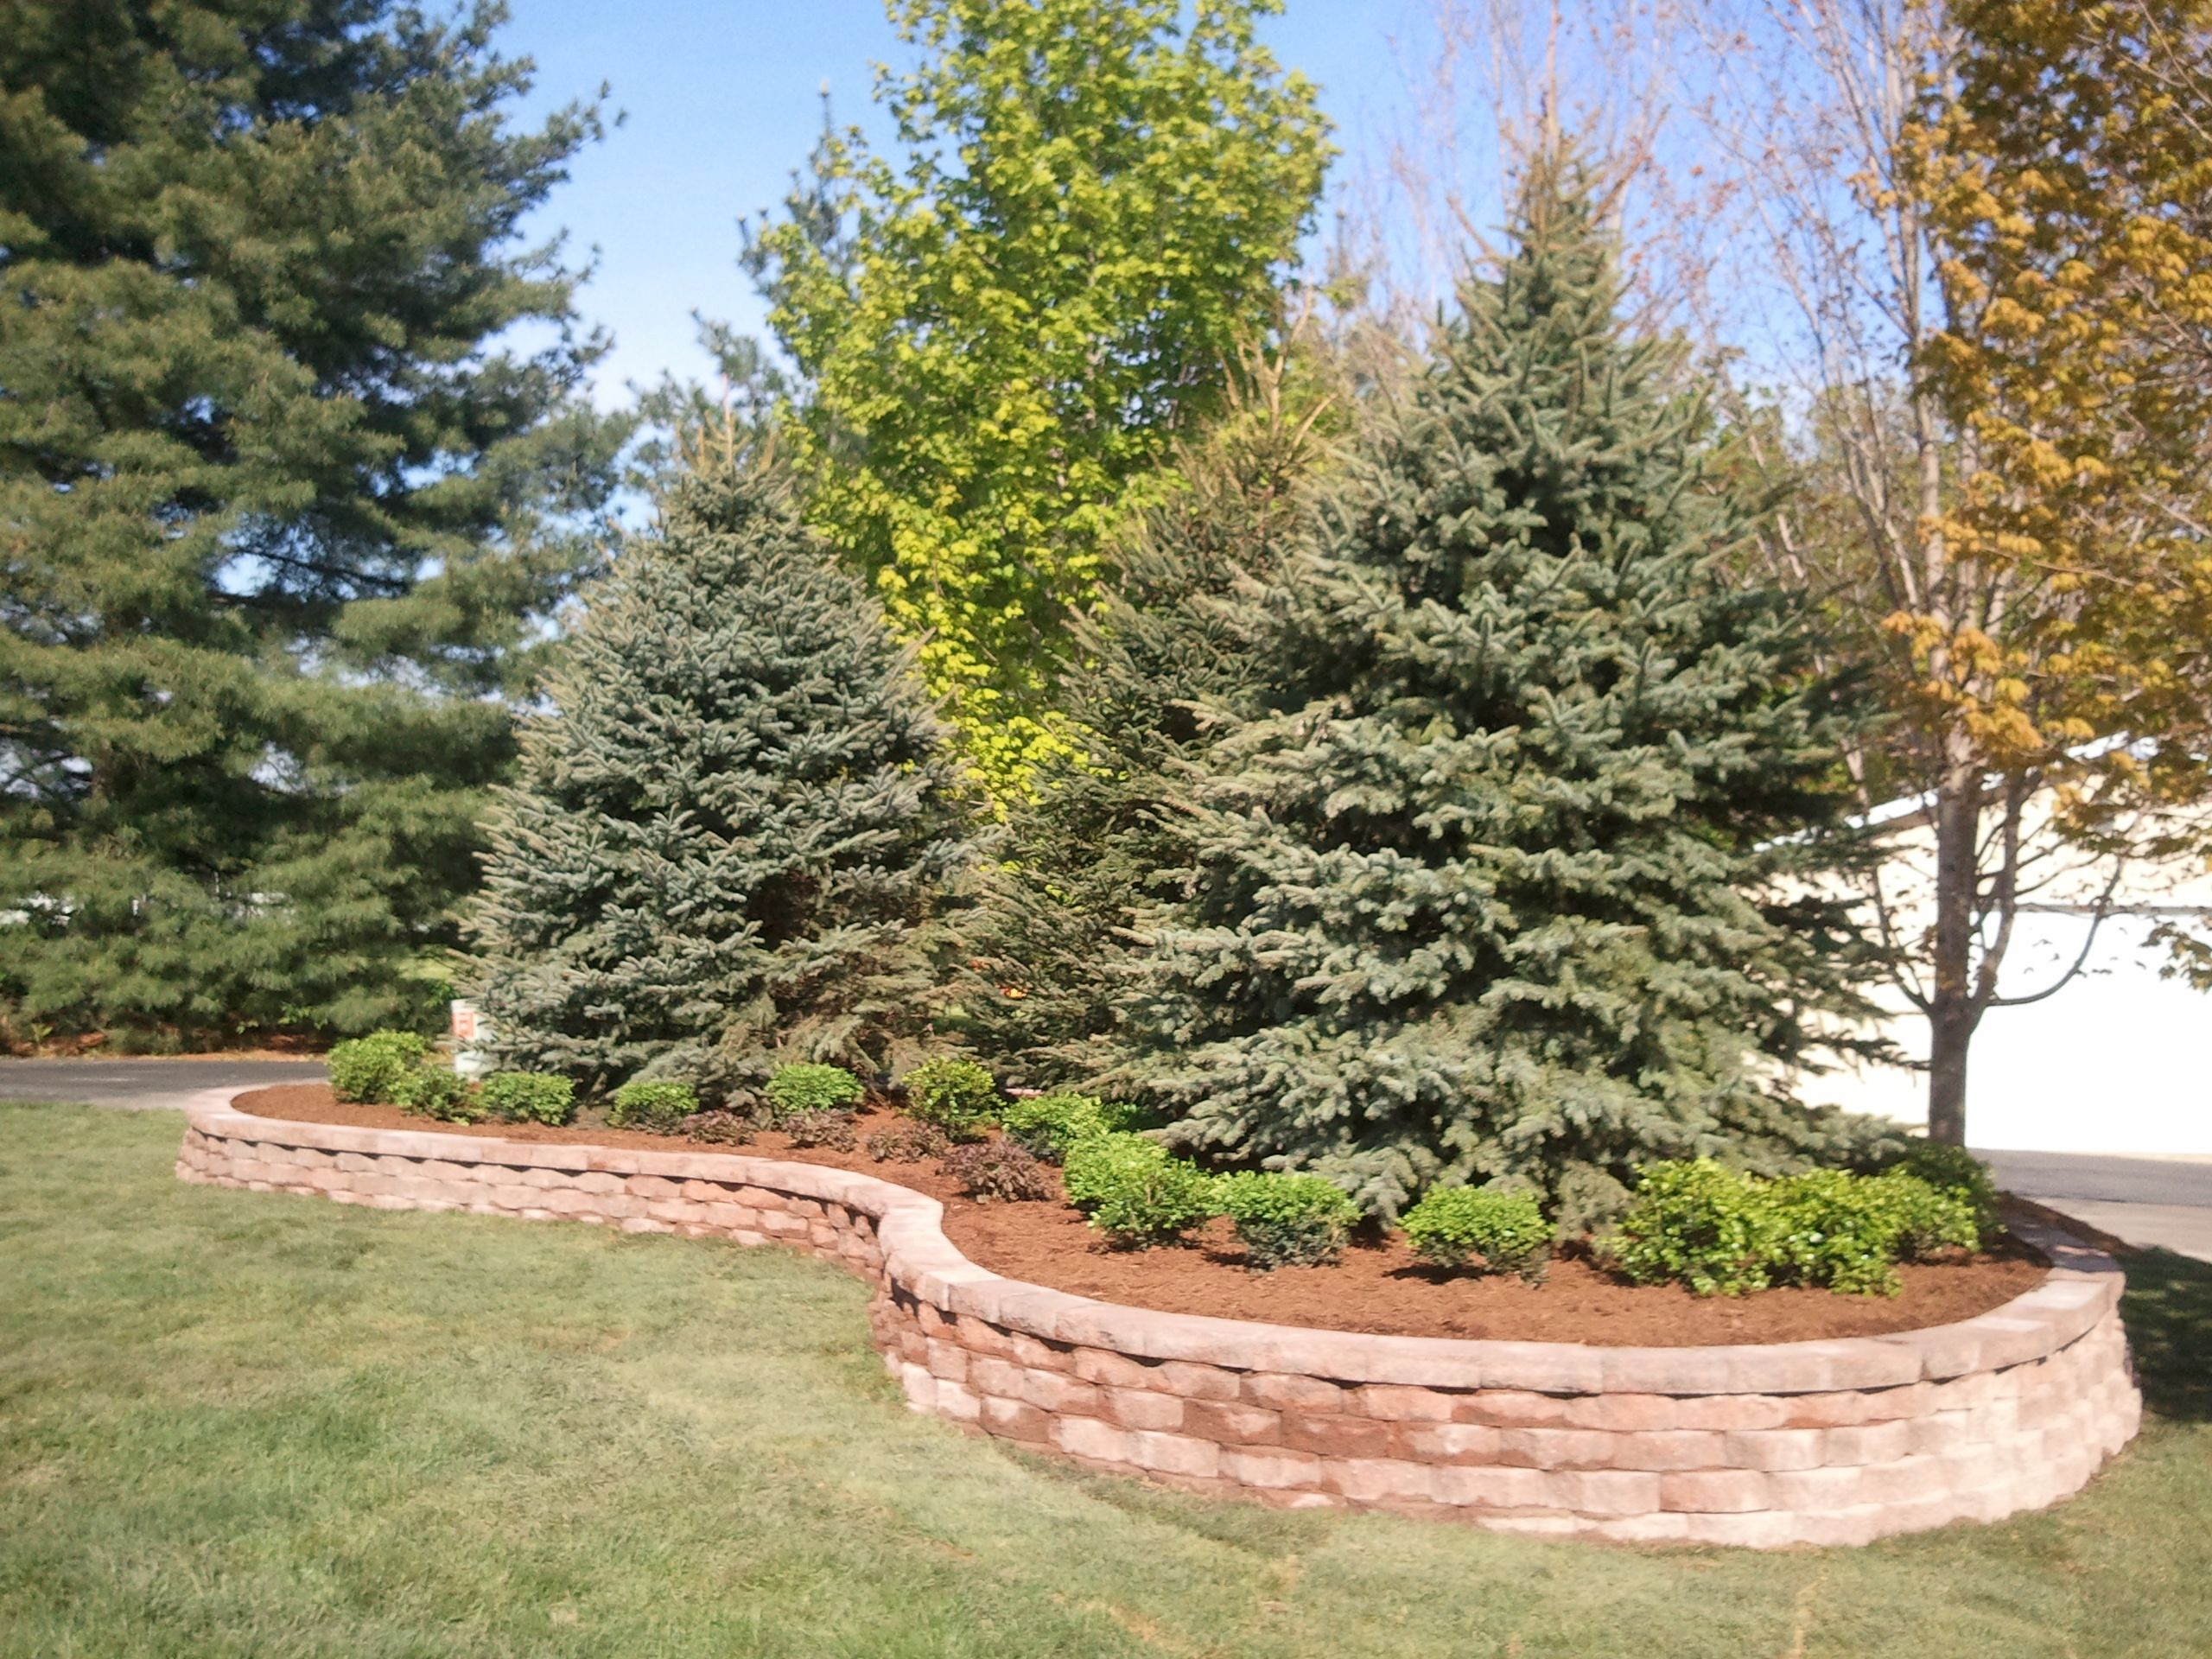 Raised Landscape Bed Large Colorado Blue Spruce Tree 400 x 300